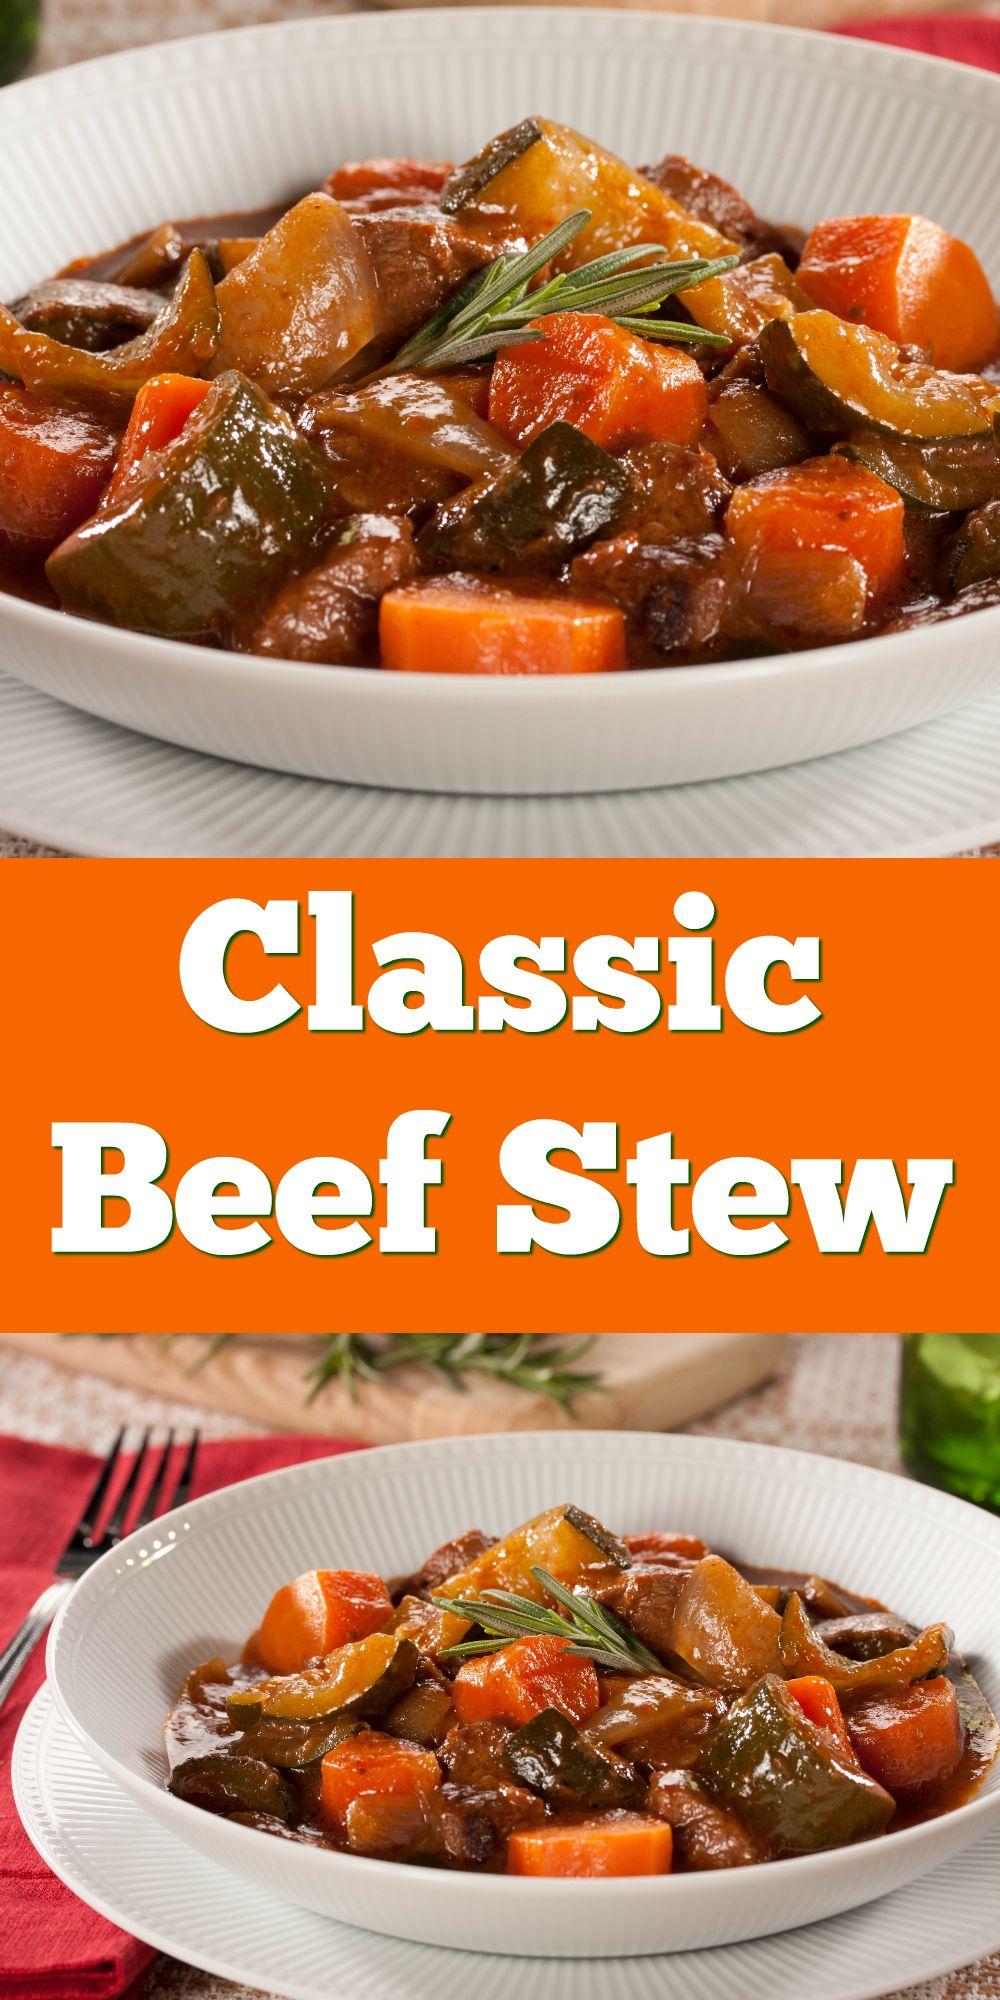 Classic Beef Stew Recipe Diabetic Friendly Dinner Recipes Stew Recipes Classic Beef Stew